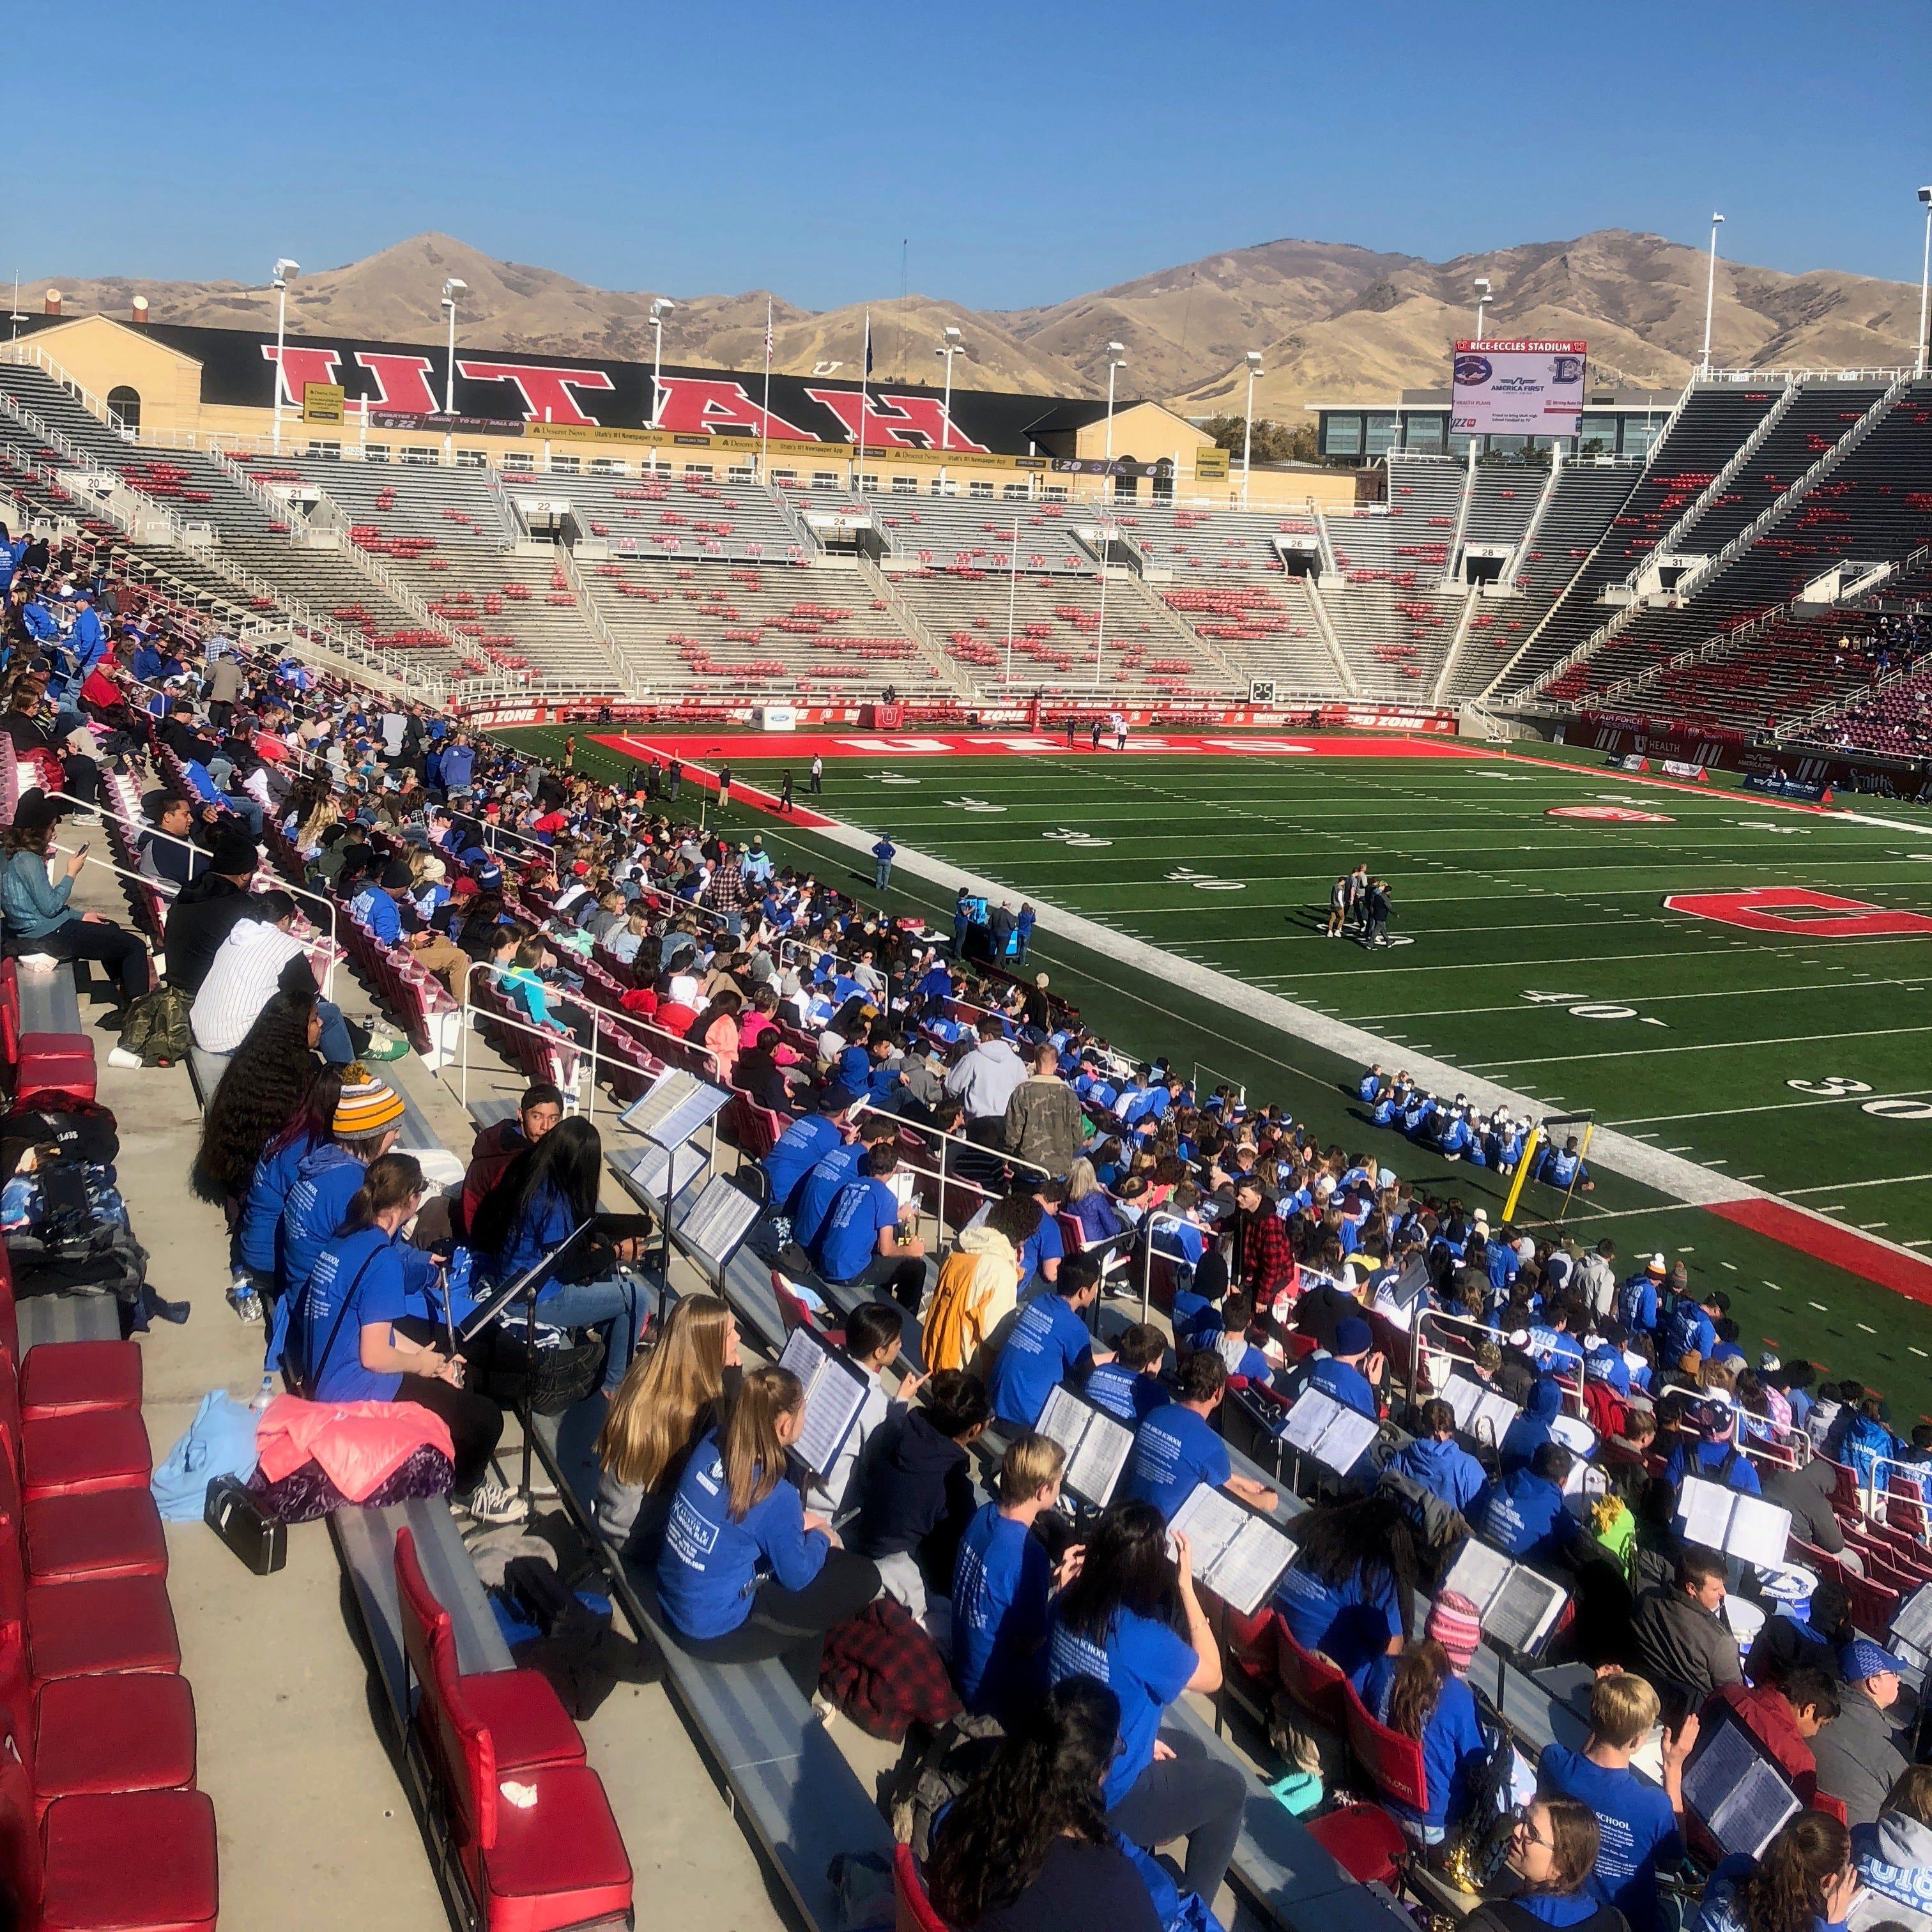 Utah 4A state footballs finals live blog: Orem stomps Dixie 60-13